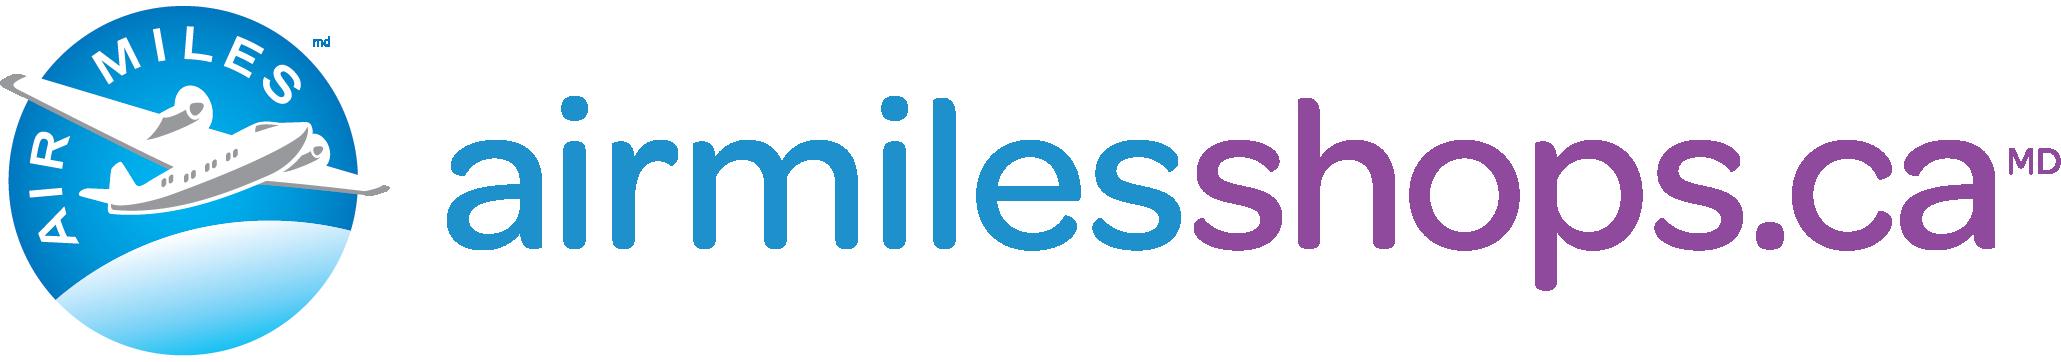 airmilesshops.ca